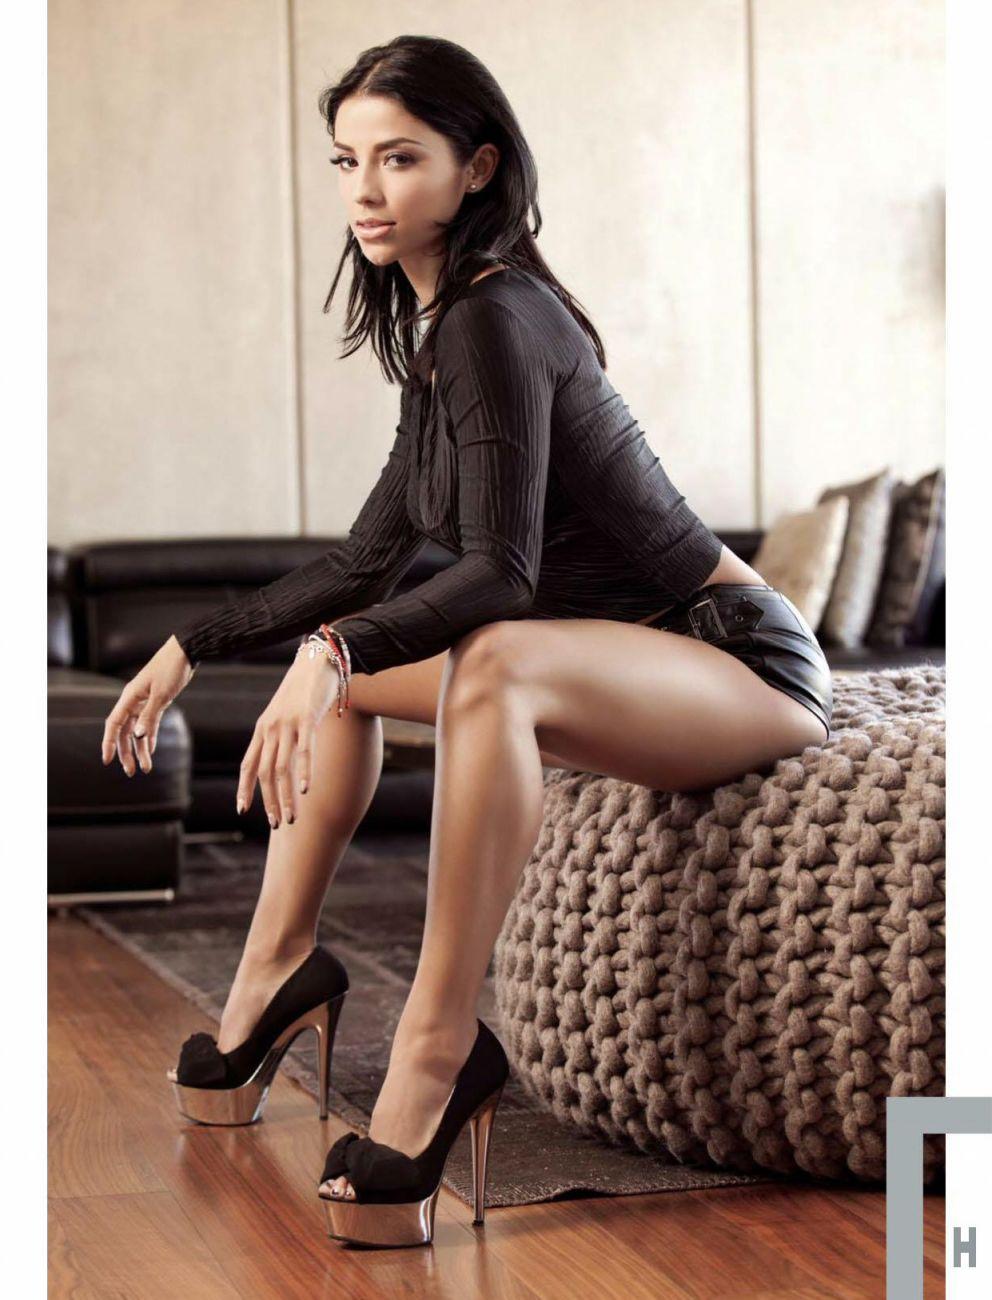 Maria Fernanda Telesco nude (25 photo), Ass, Fappening, Boobs, lingerie 2015